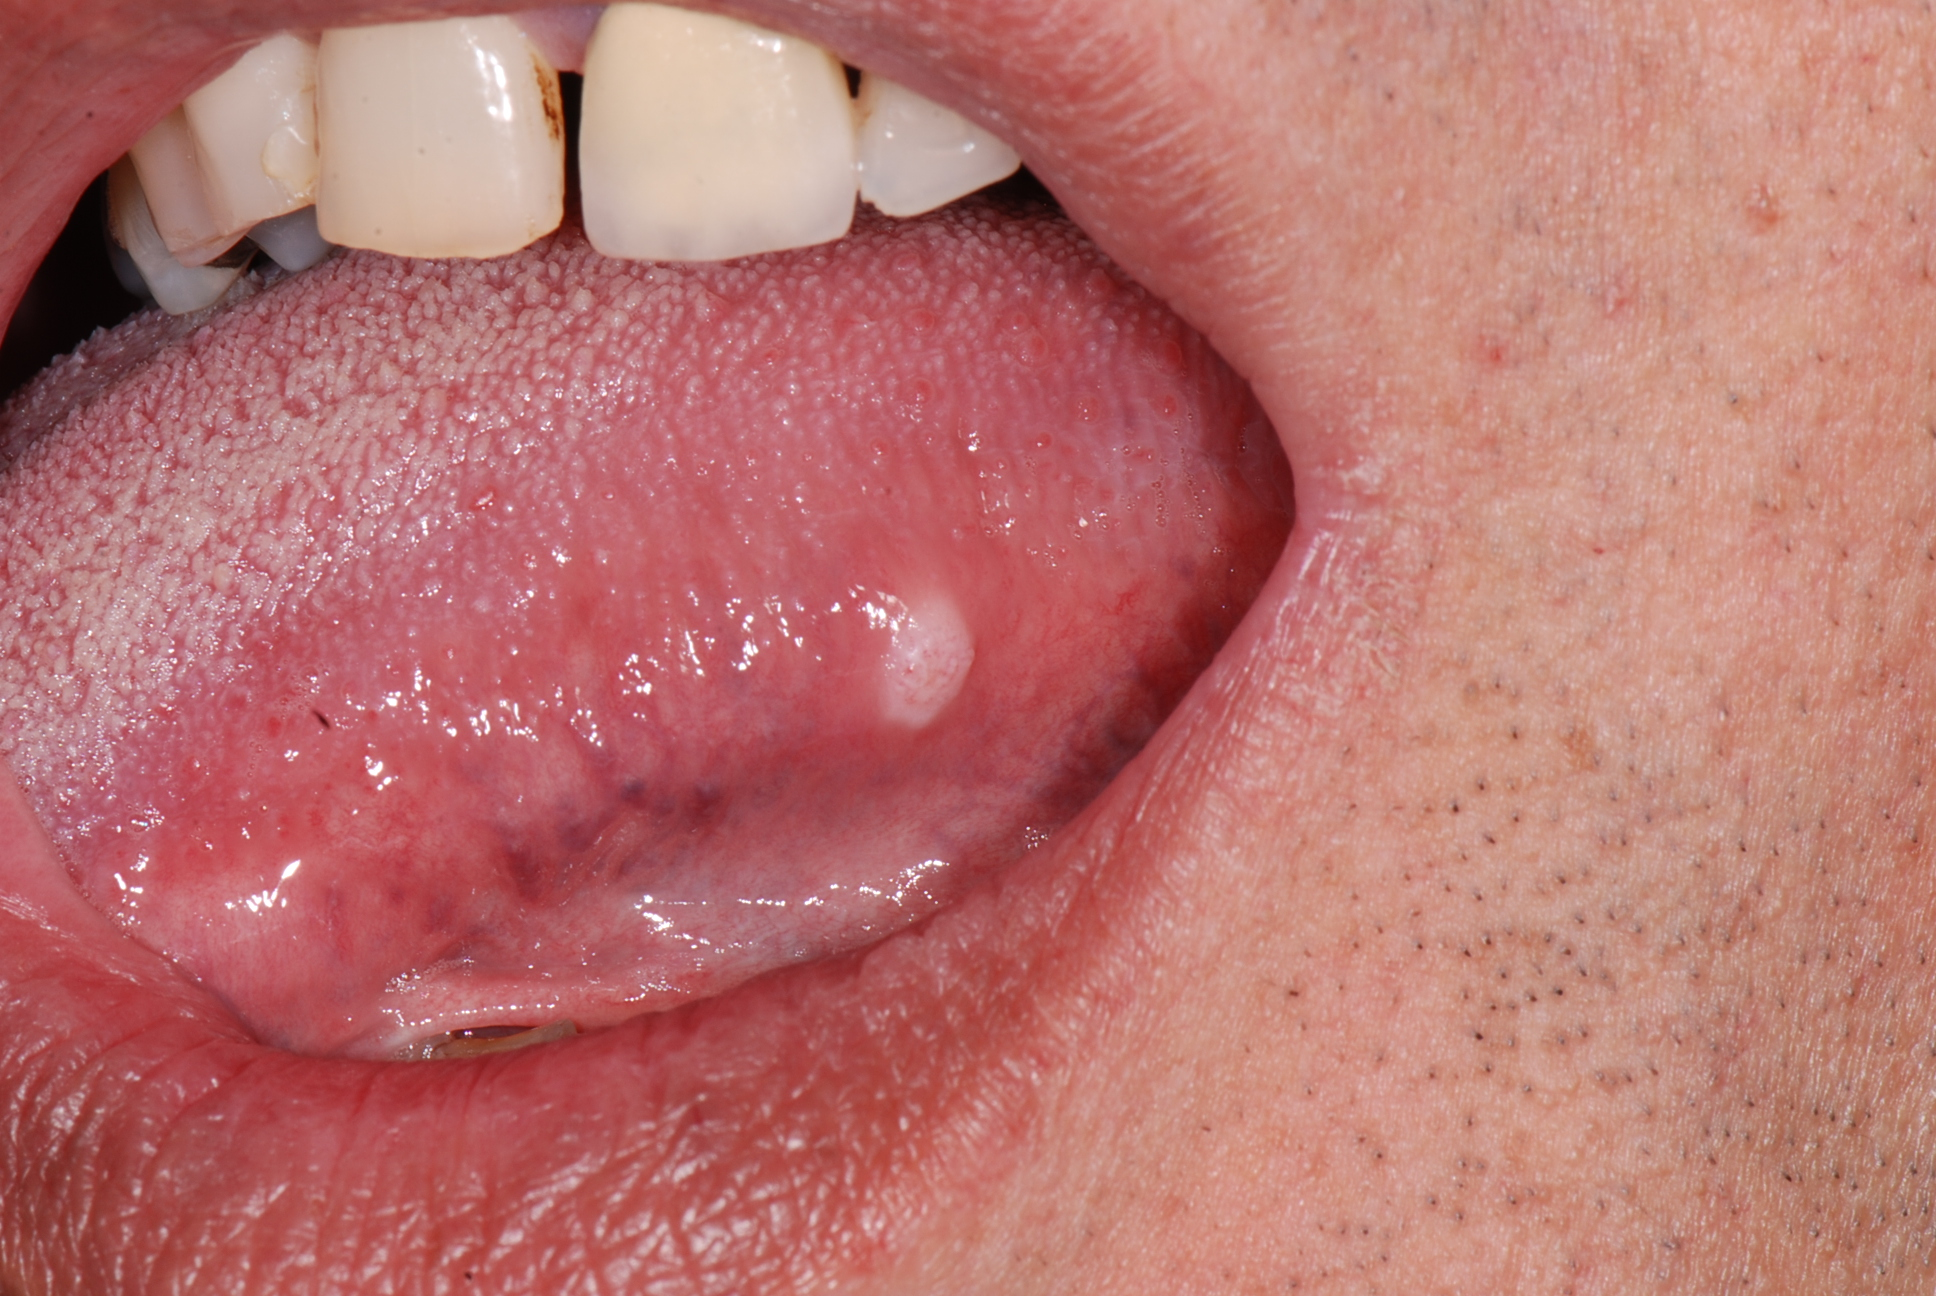 Juvenile Ossifying Fibroma